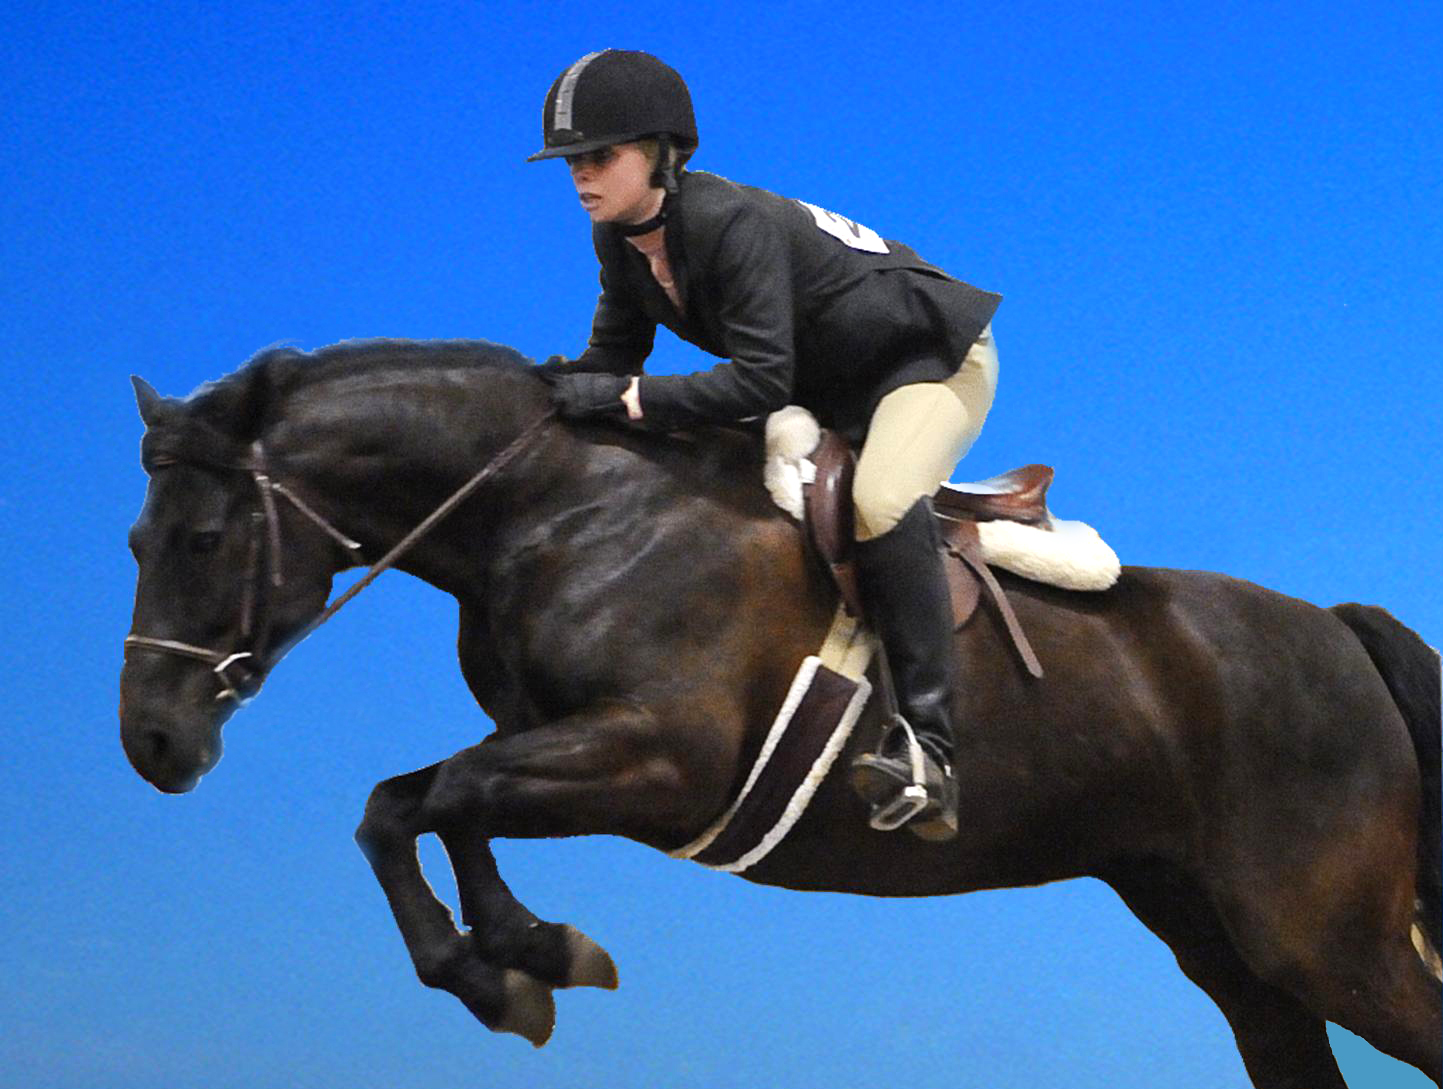 Black horses jumping - photo#4